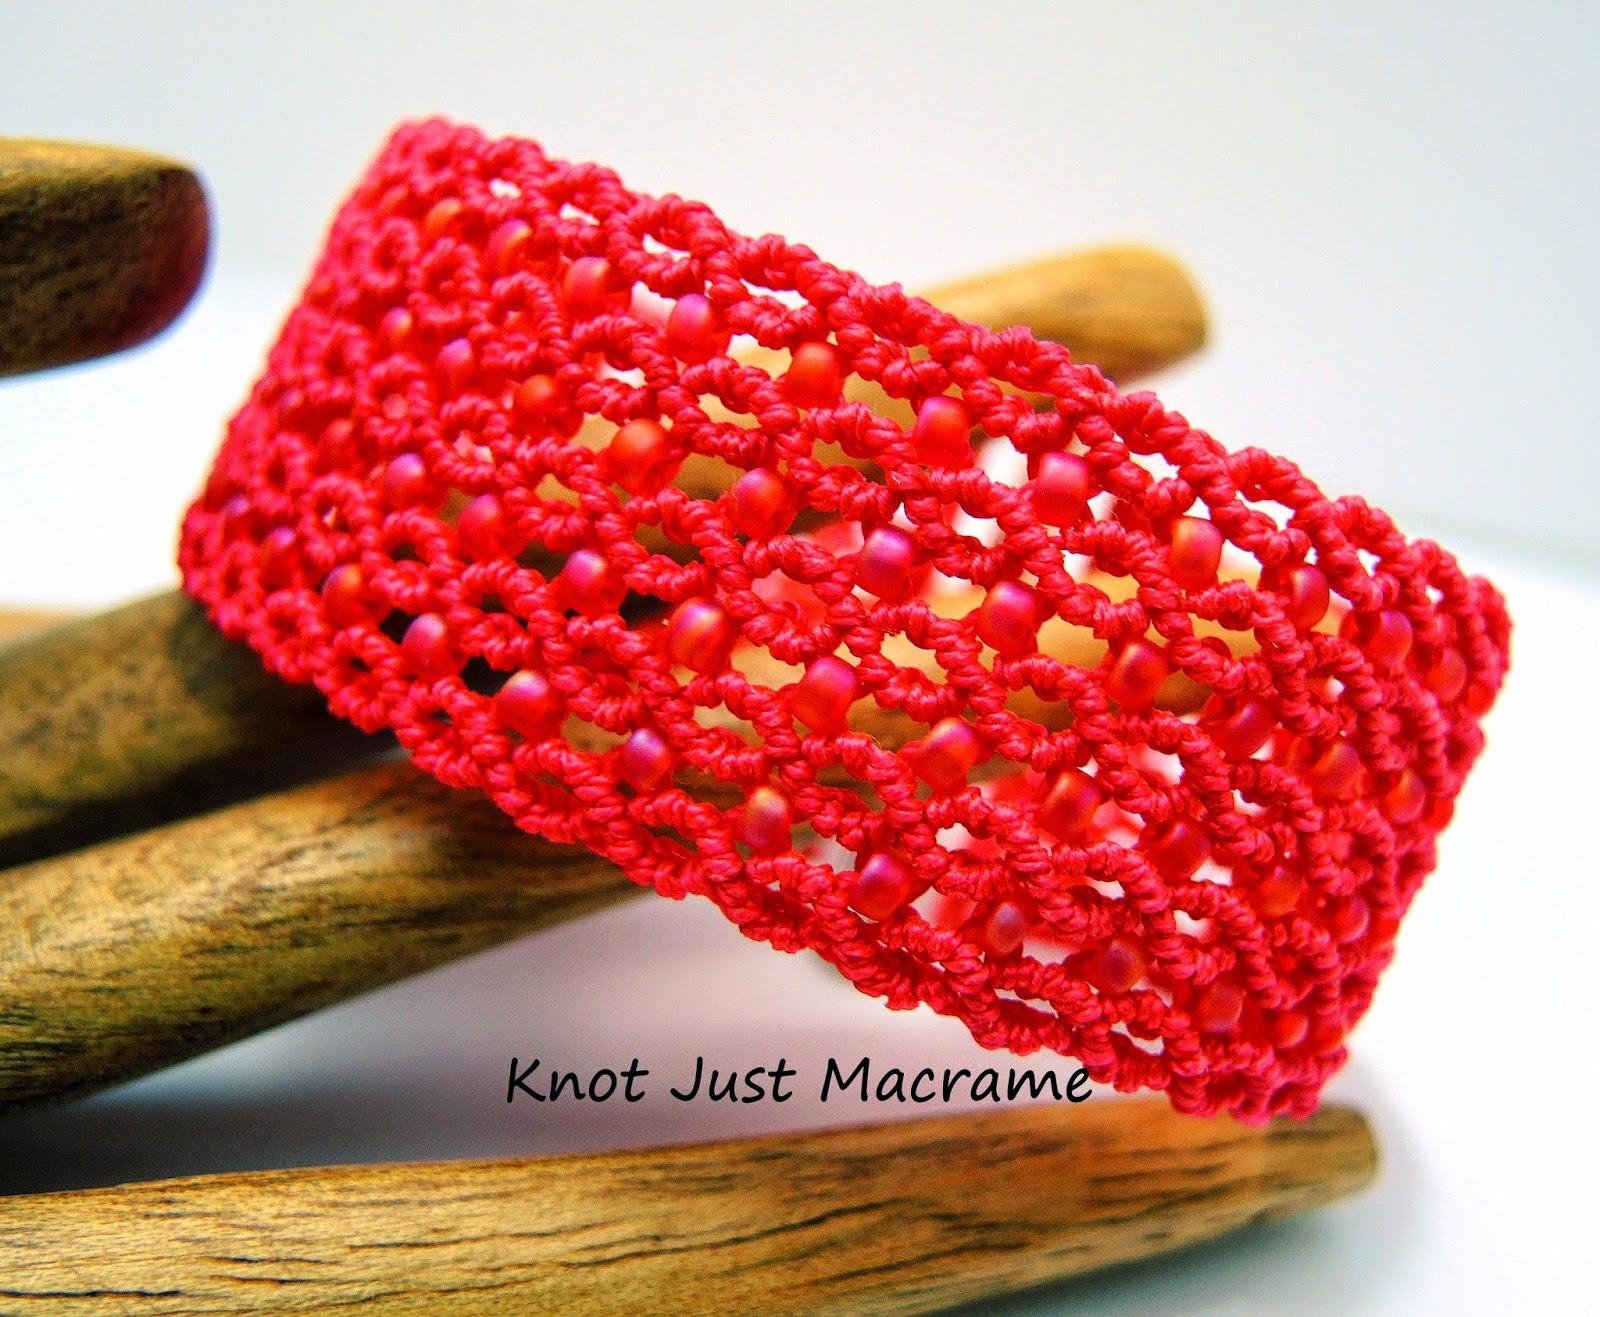 Micro macrame cuff bracelet in red by Sherri Stokey.